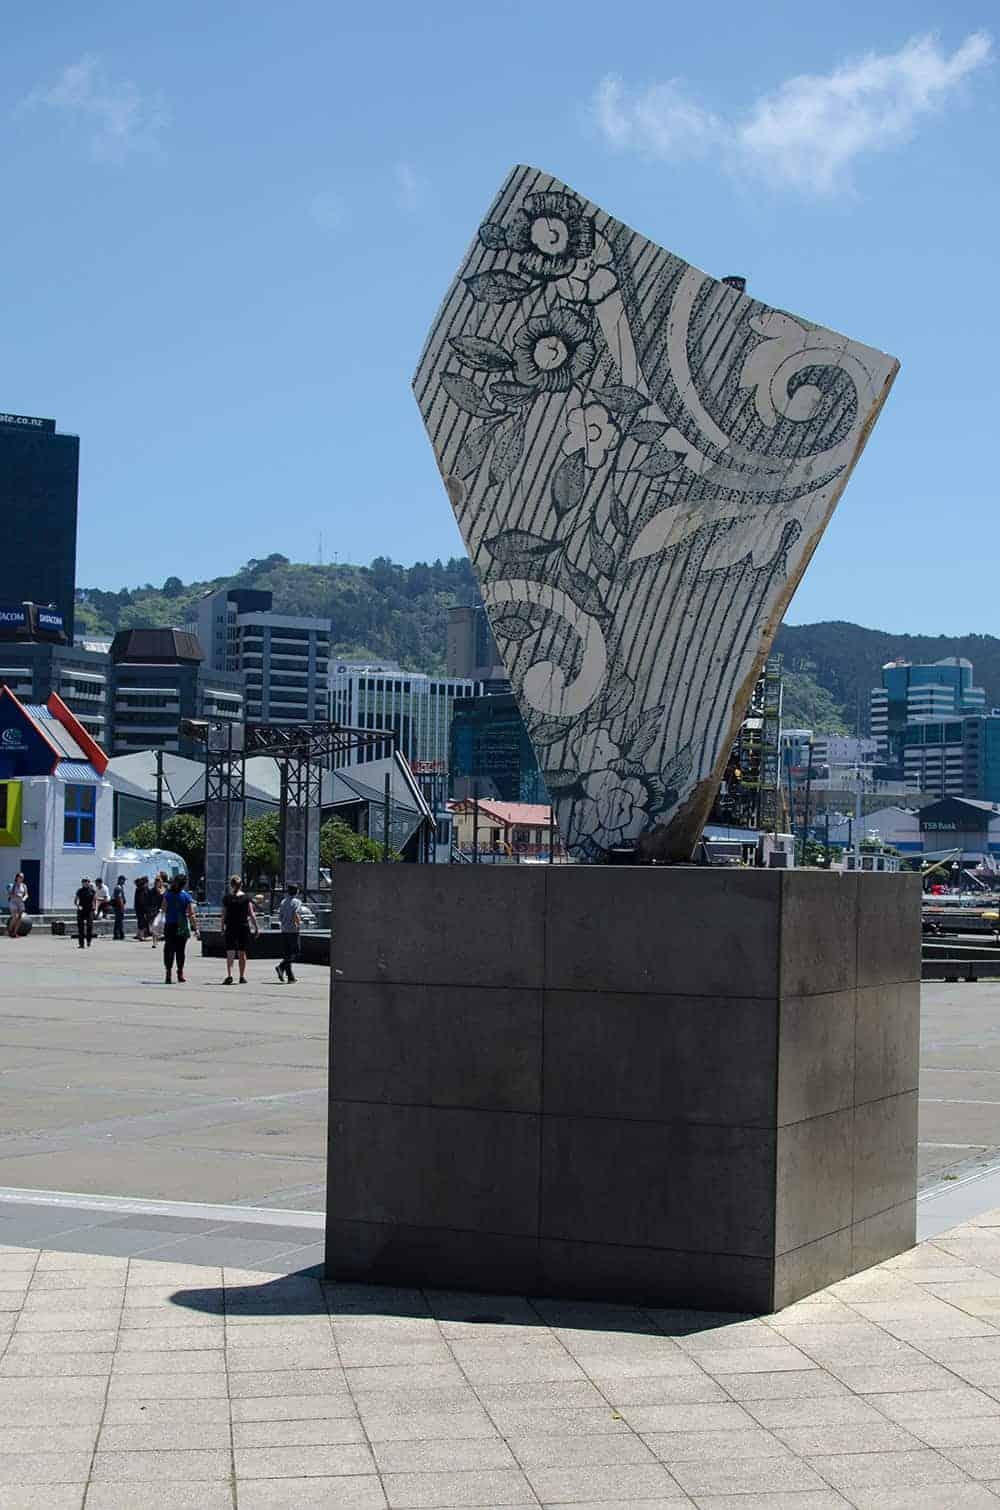 New ZealandWellington